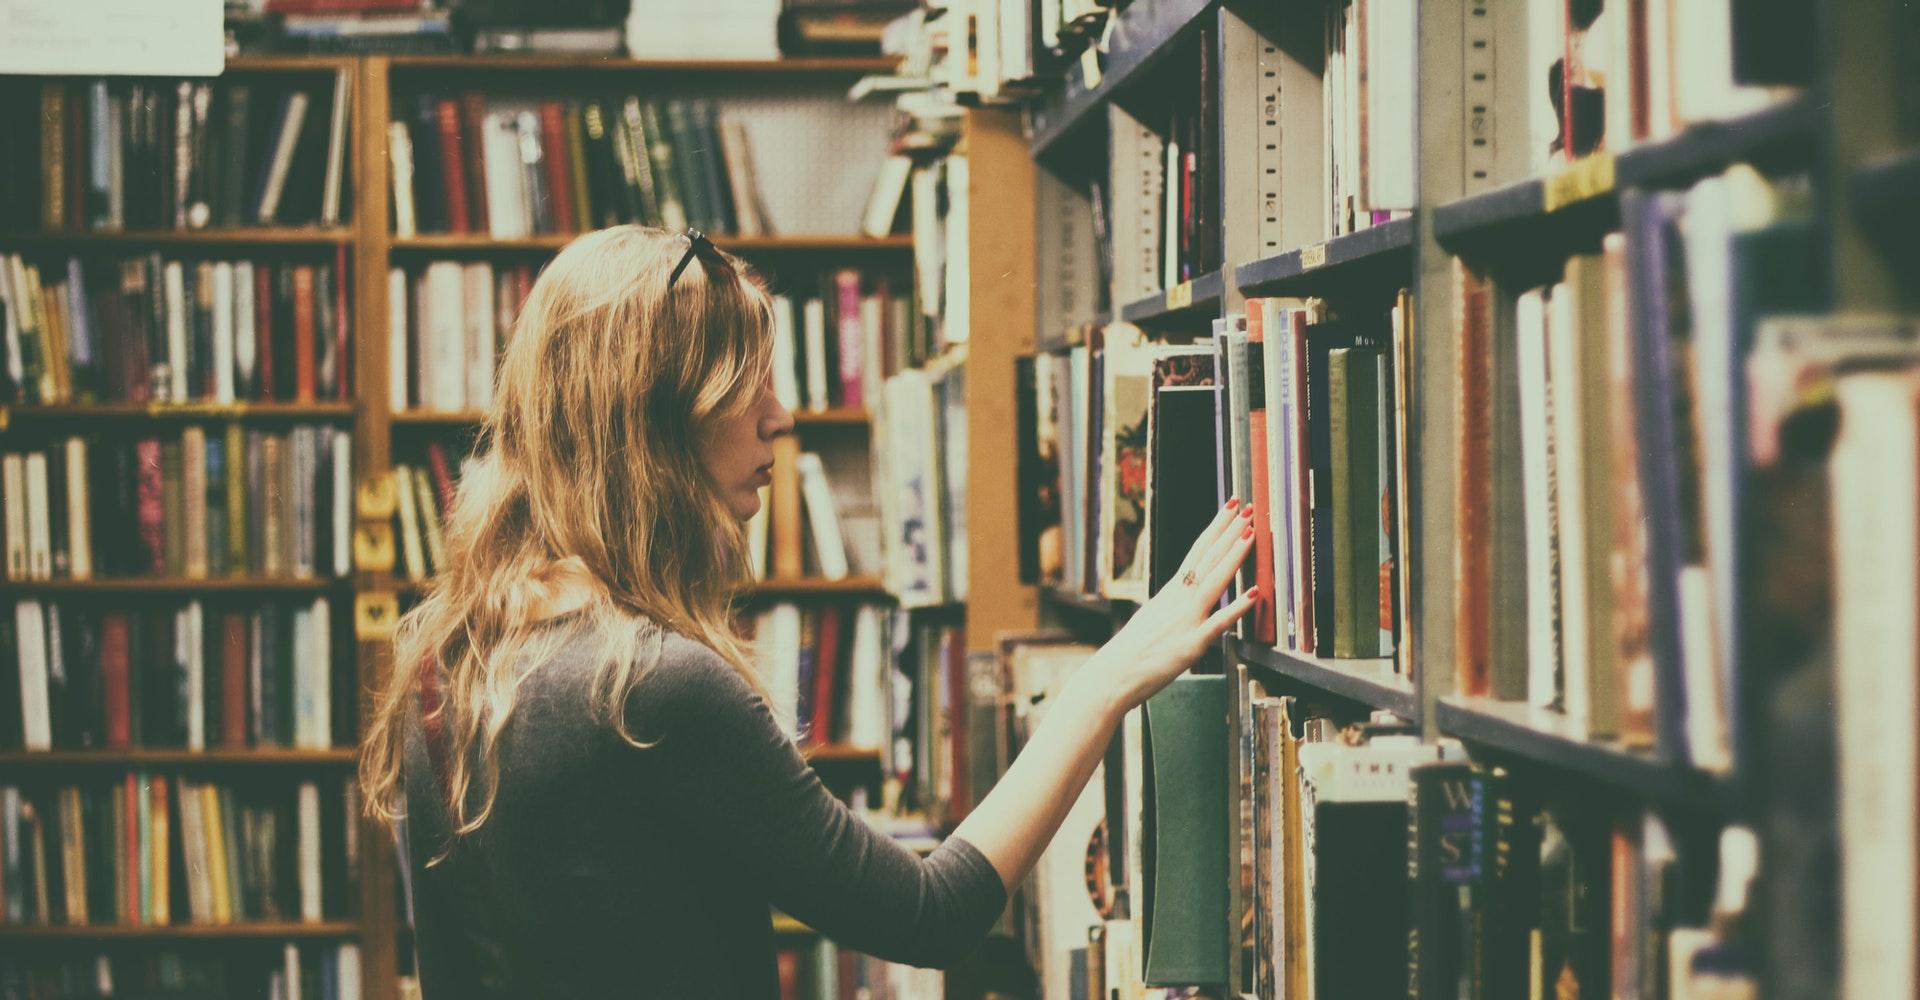 university-presses-maxize-content-consumption